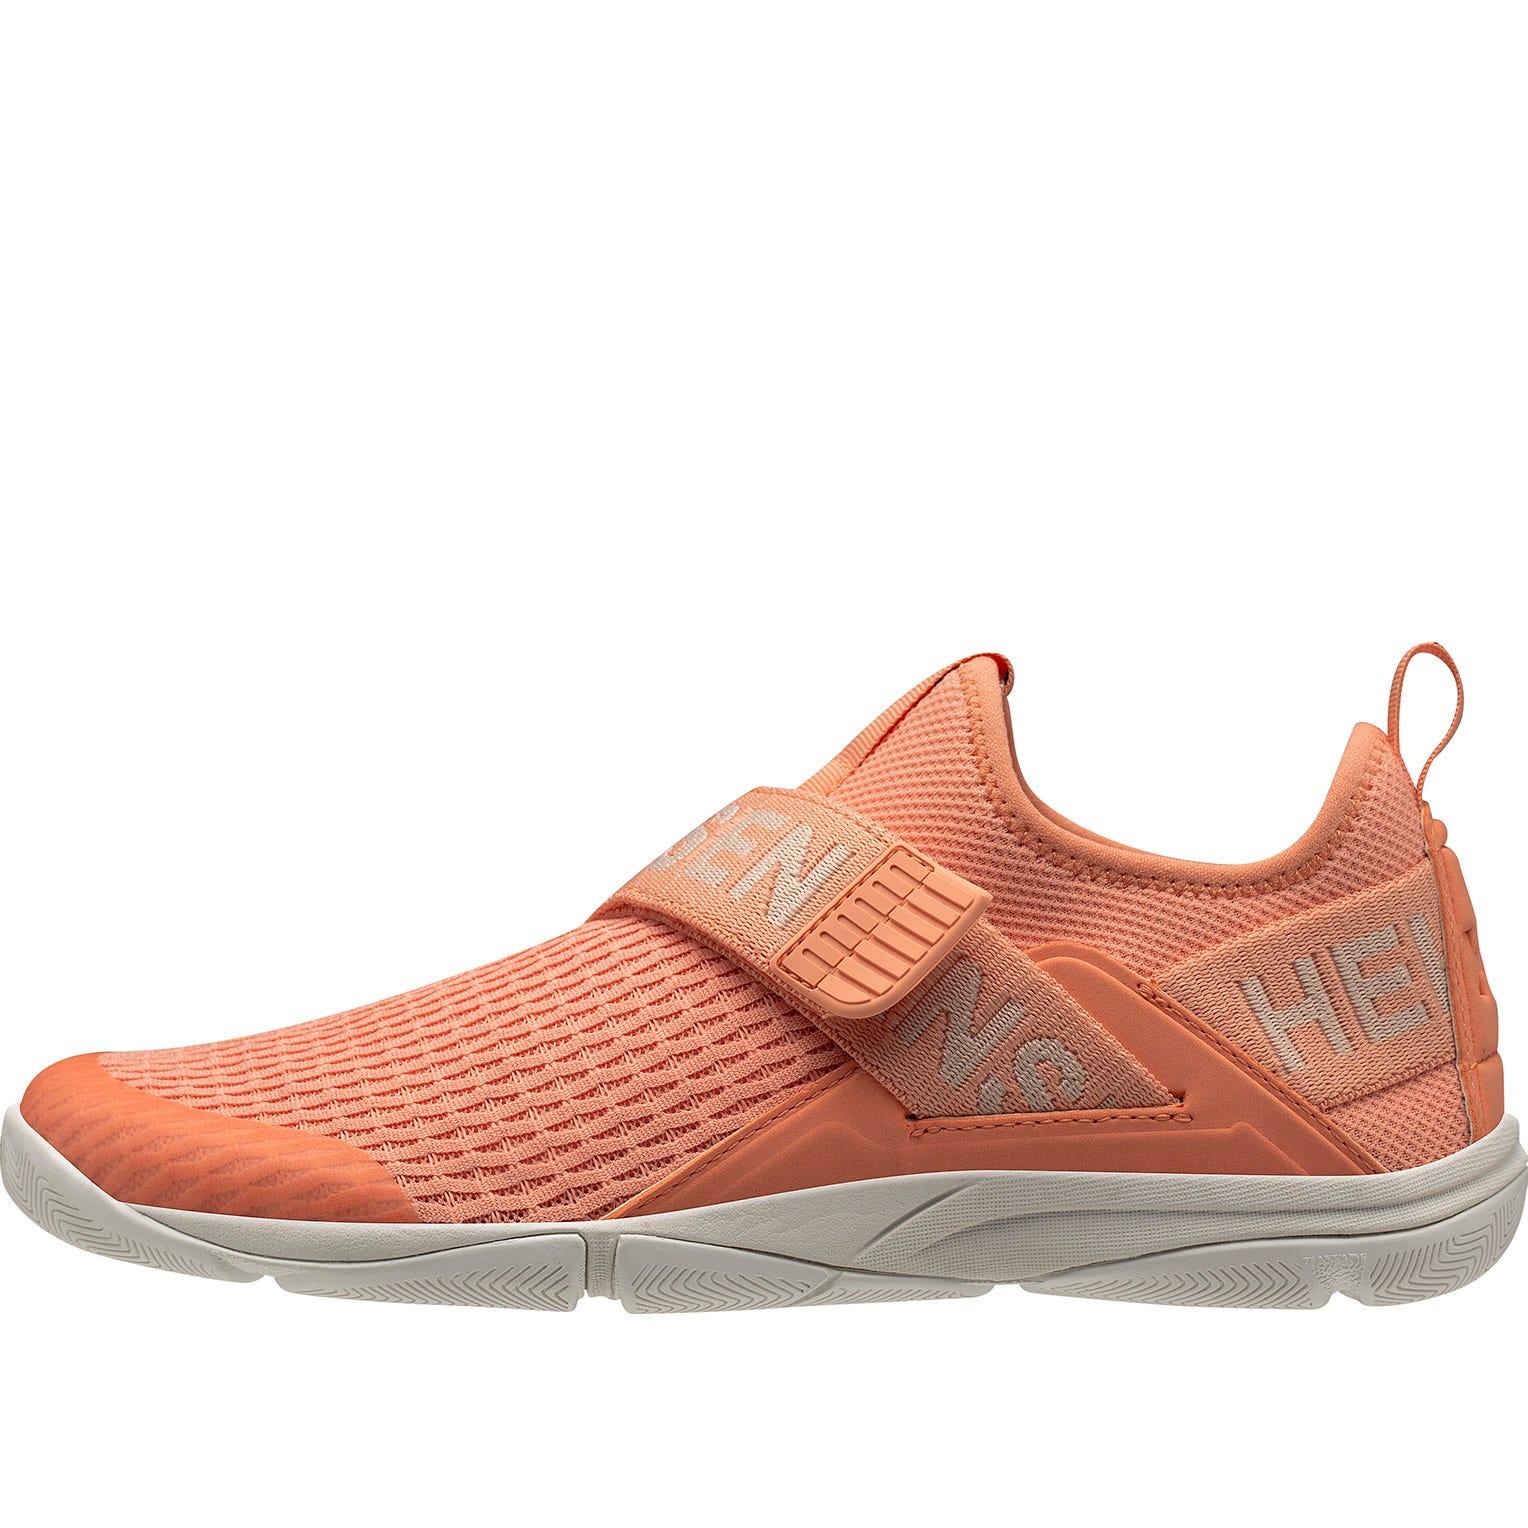 Helly Hansen Womens Hydromoc Slipon Shoe Sailing Orange 7